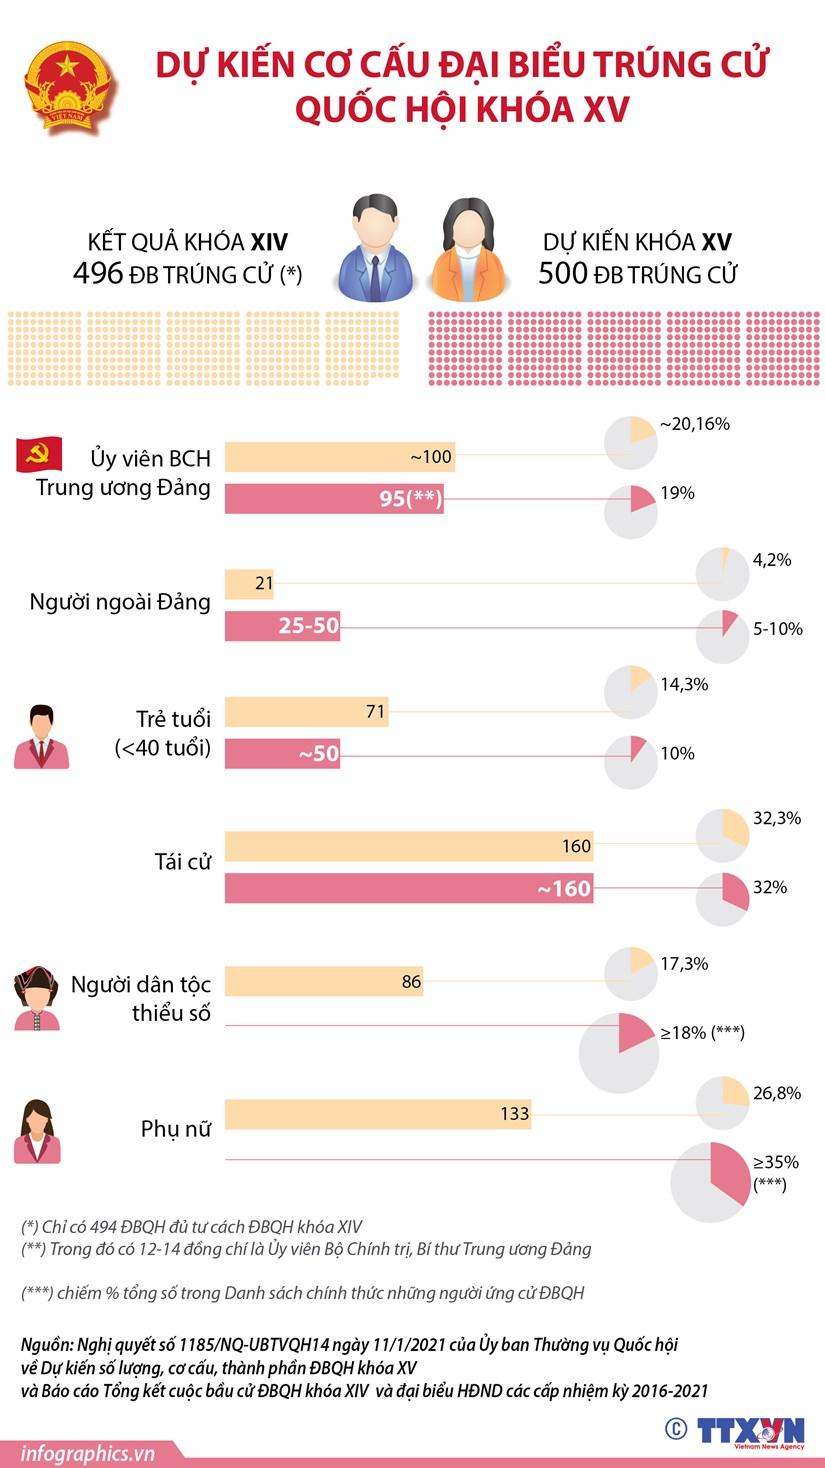 [Infographics] Du kien co cau dai bieu trung cu Quoc hoi khoa XV hinh anh 1